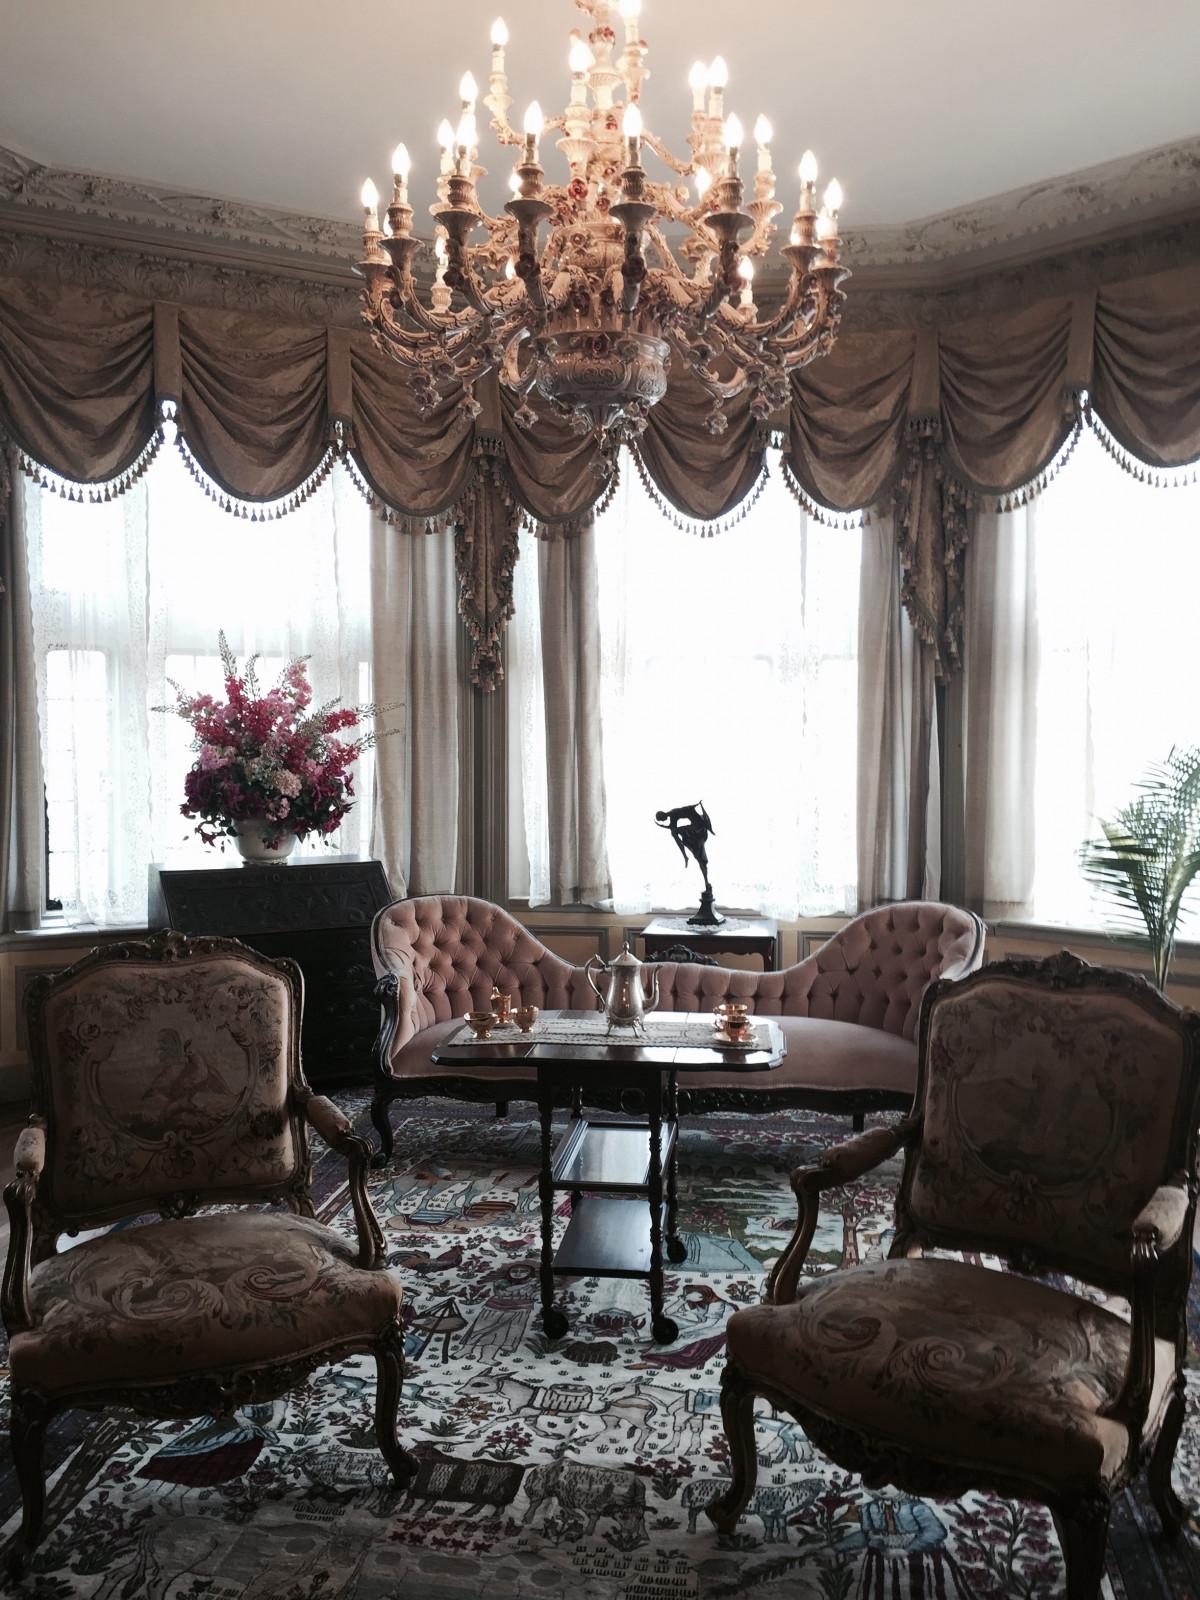 Fotos gratis cortina sala habitaci n decoraci n material dise o de interiores textil - Decoracion de interiores gratis ...